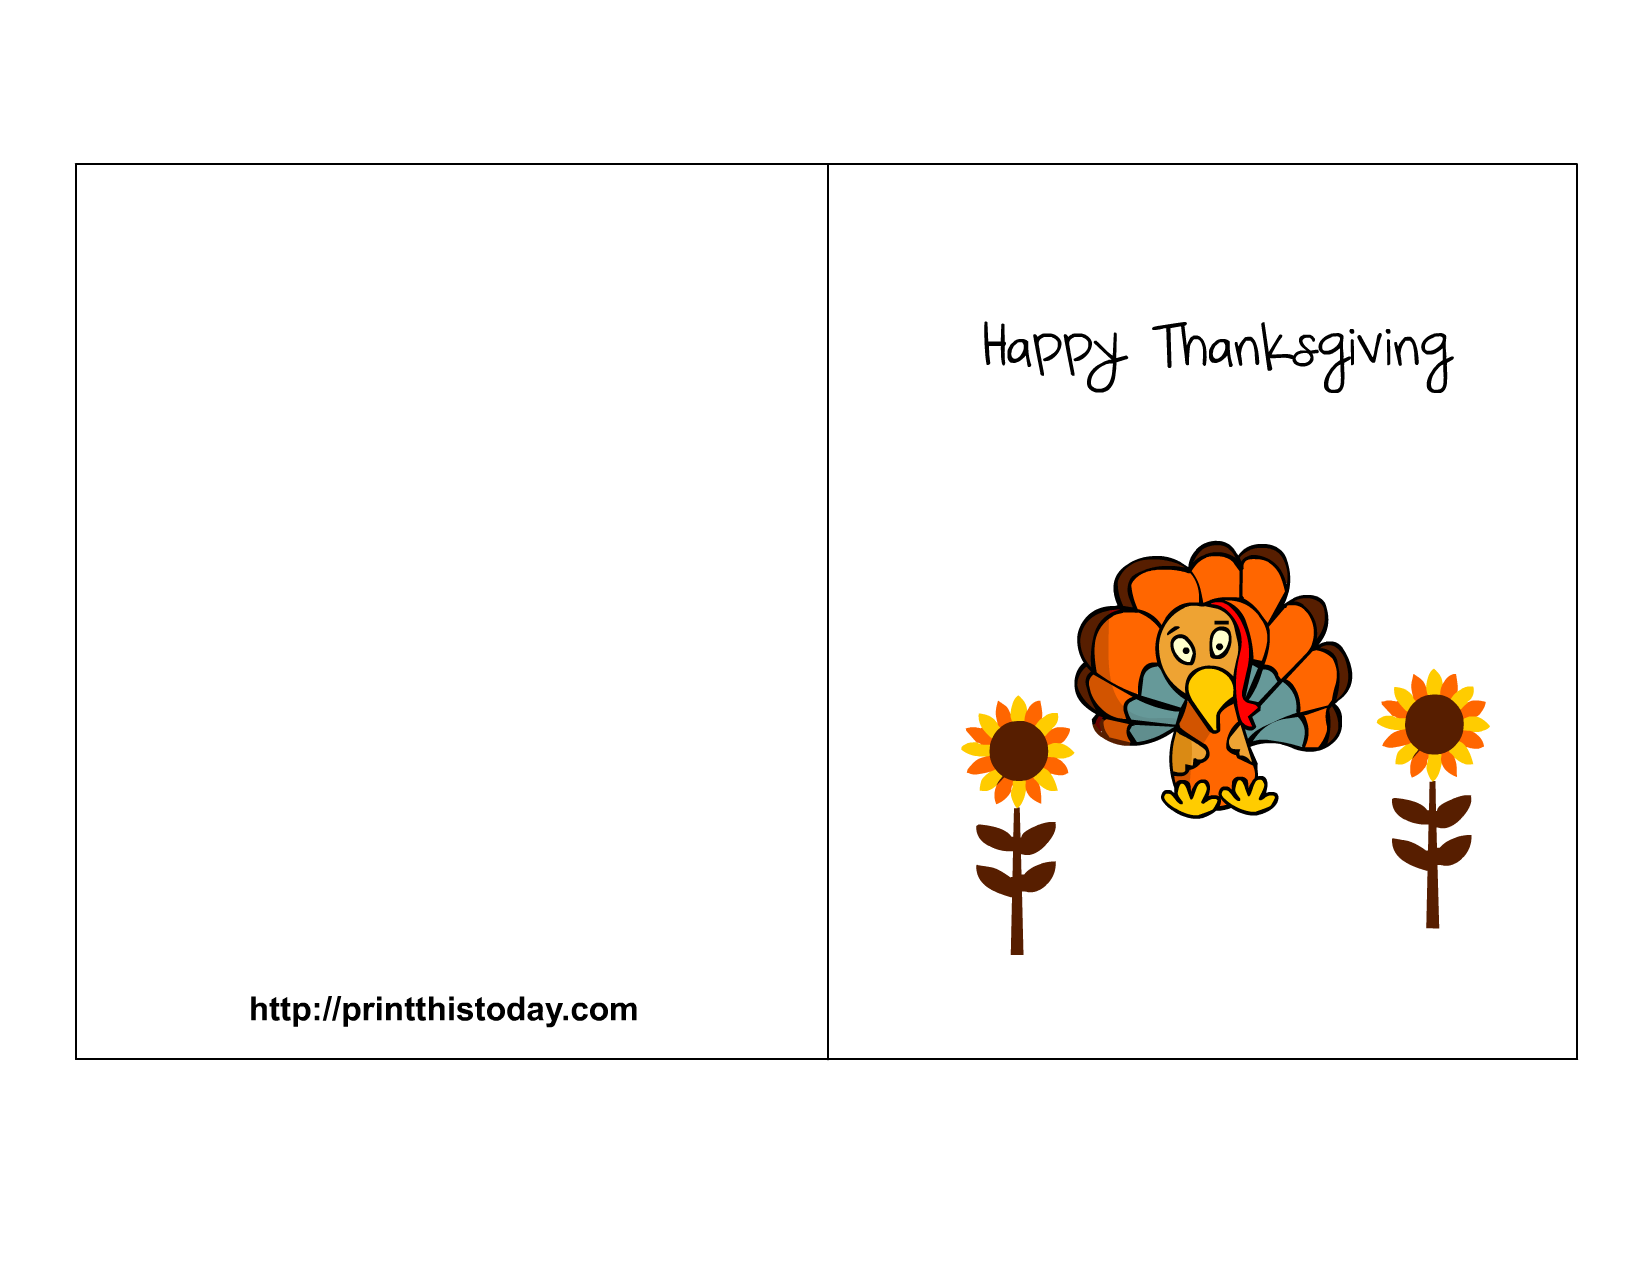 Printable Thanksgiving Card